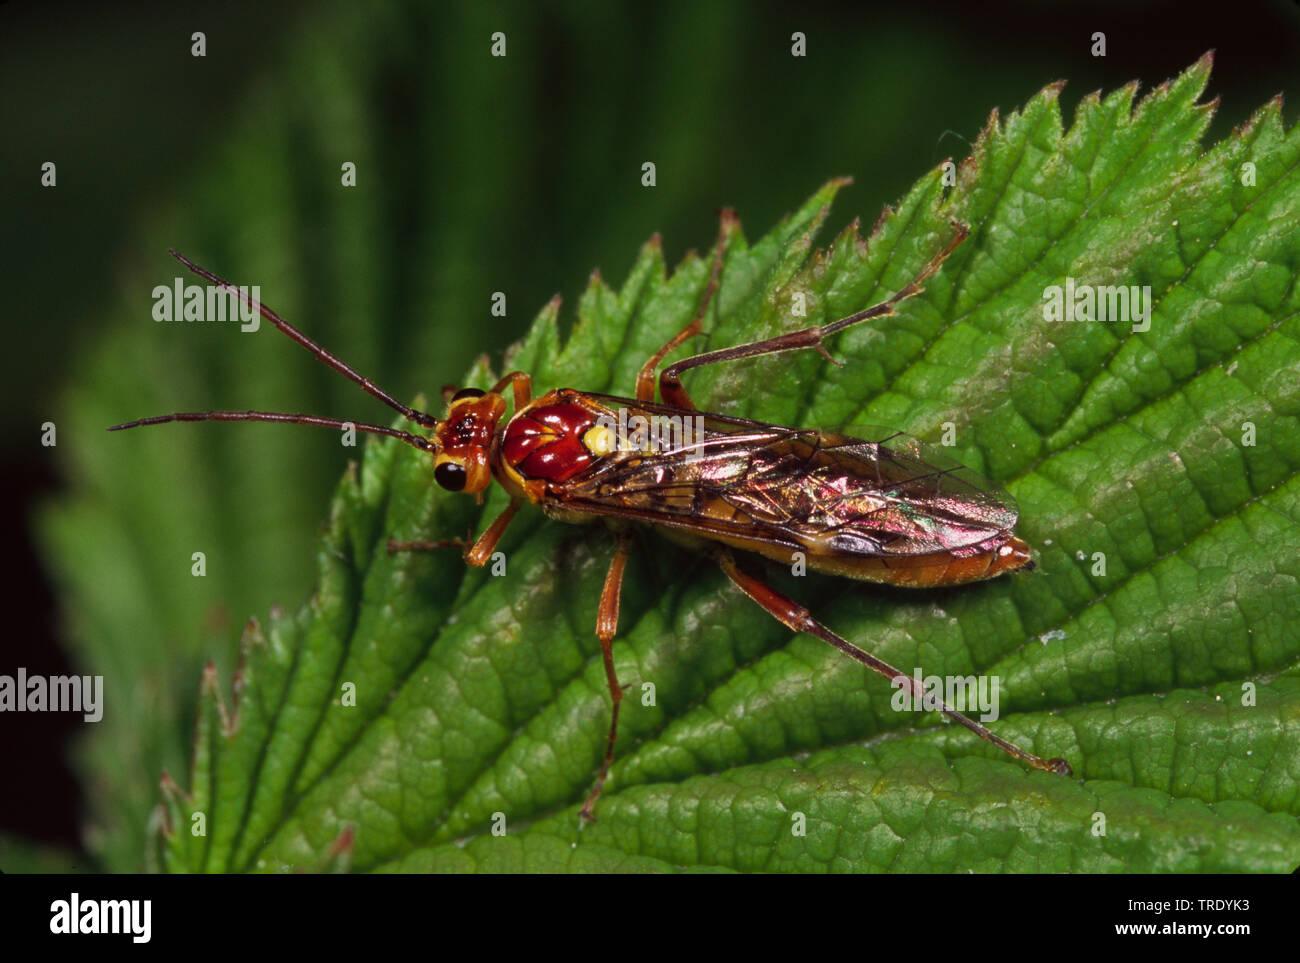 Pflanzenwespe, Tenthredo sordida (Tenthredo sordida, Allantus sordida), sitzt auf einem Blatt, Deutschland | Tenthredo sordida (Tenthredo sordida, All - Stock Image